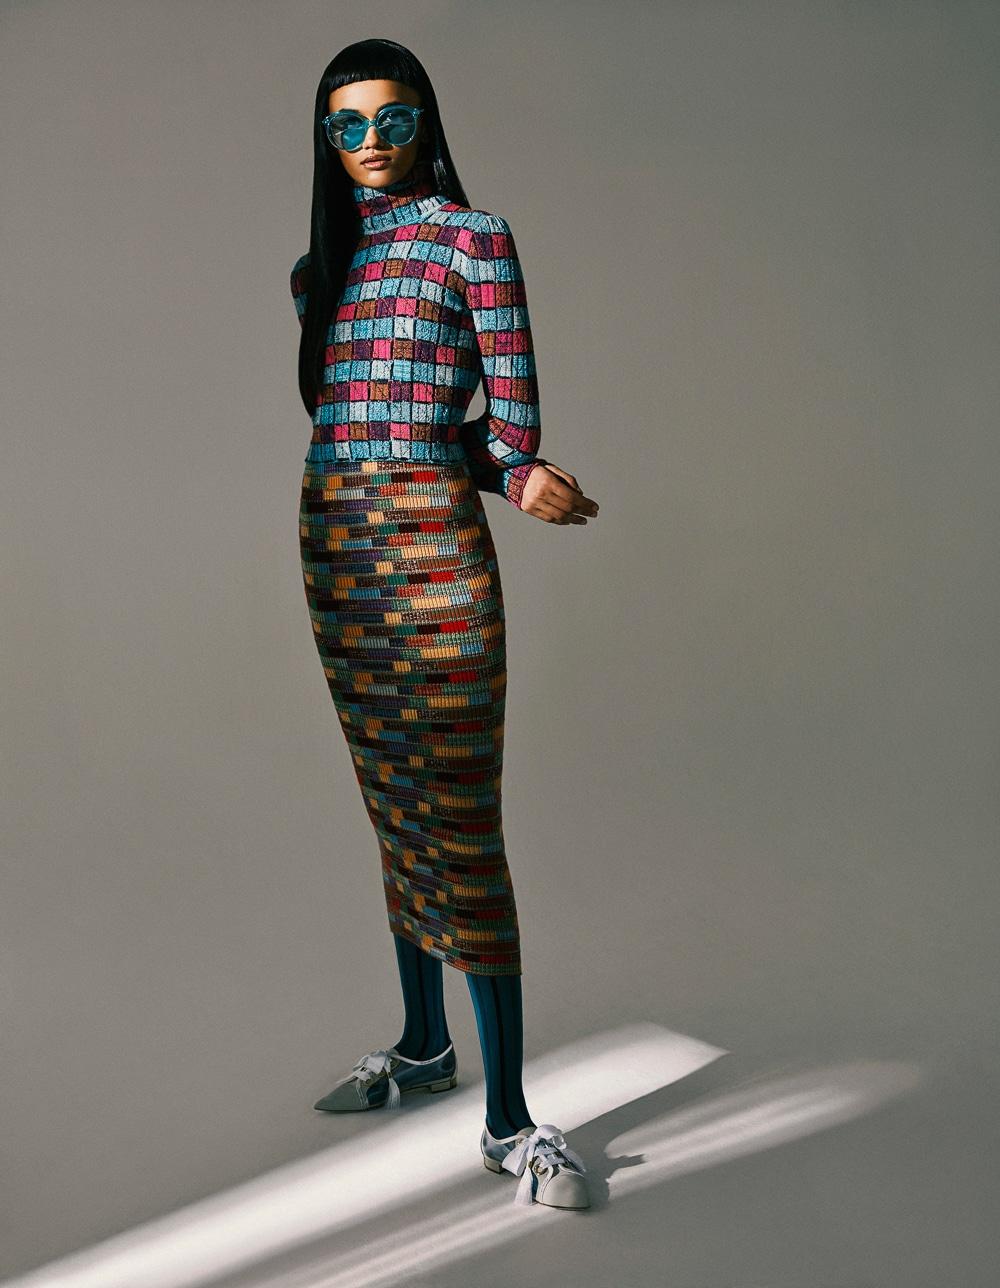 Harpers-Bazaar-Brazil-Cris-Lopes-Ivan-Erick-Menezes-4.jpg